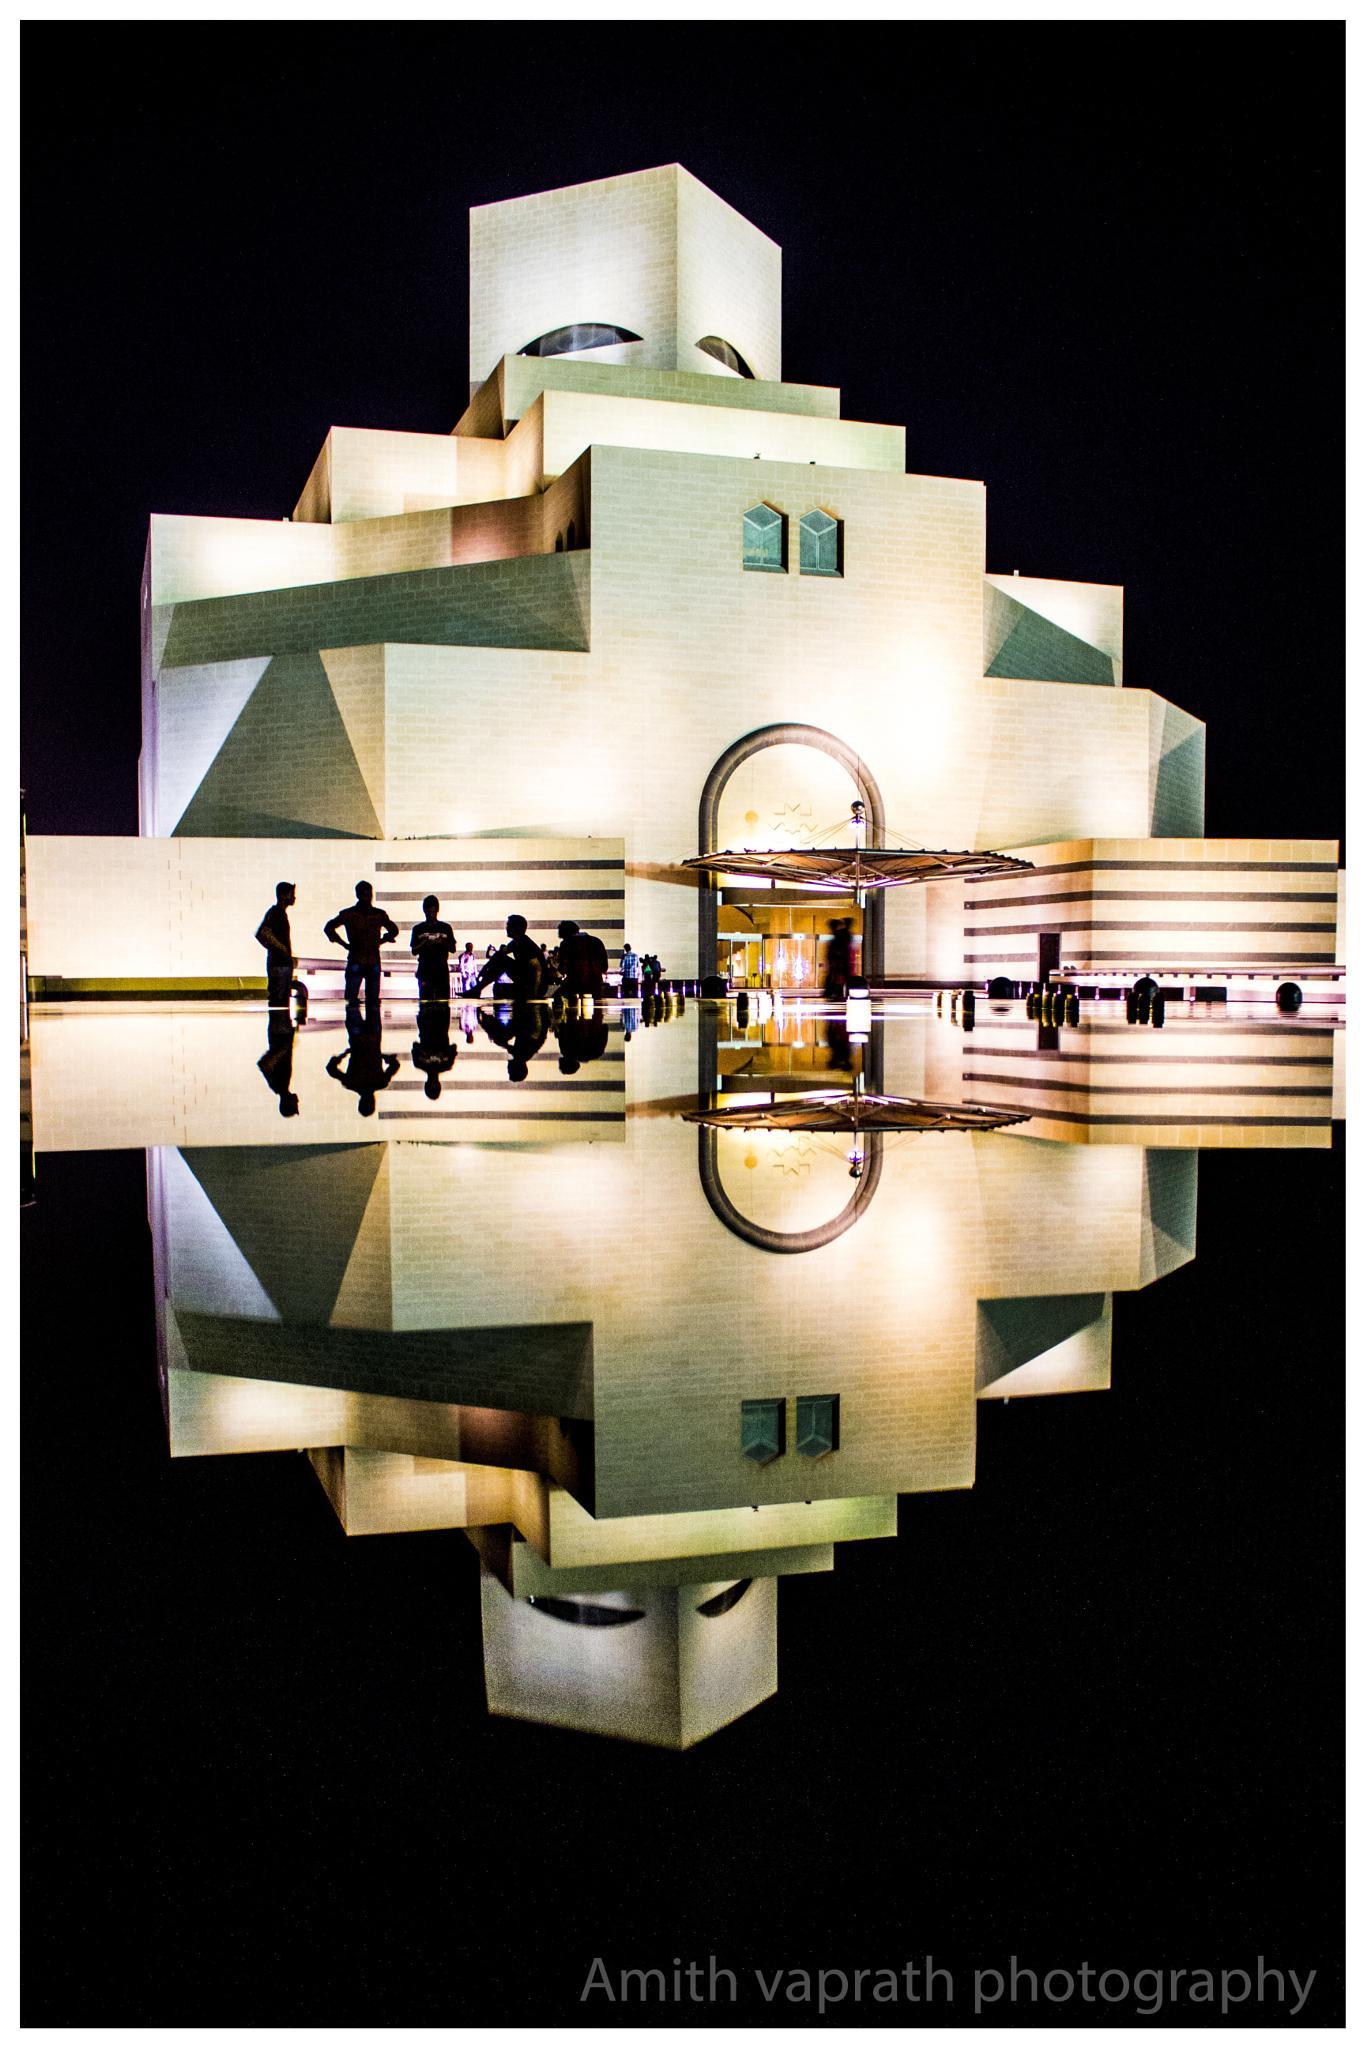 Qatar museum reflection  by Amith Vaprath